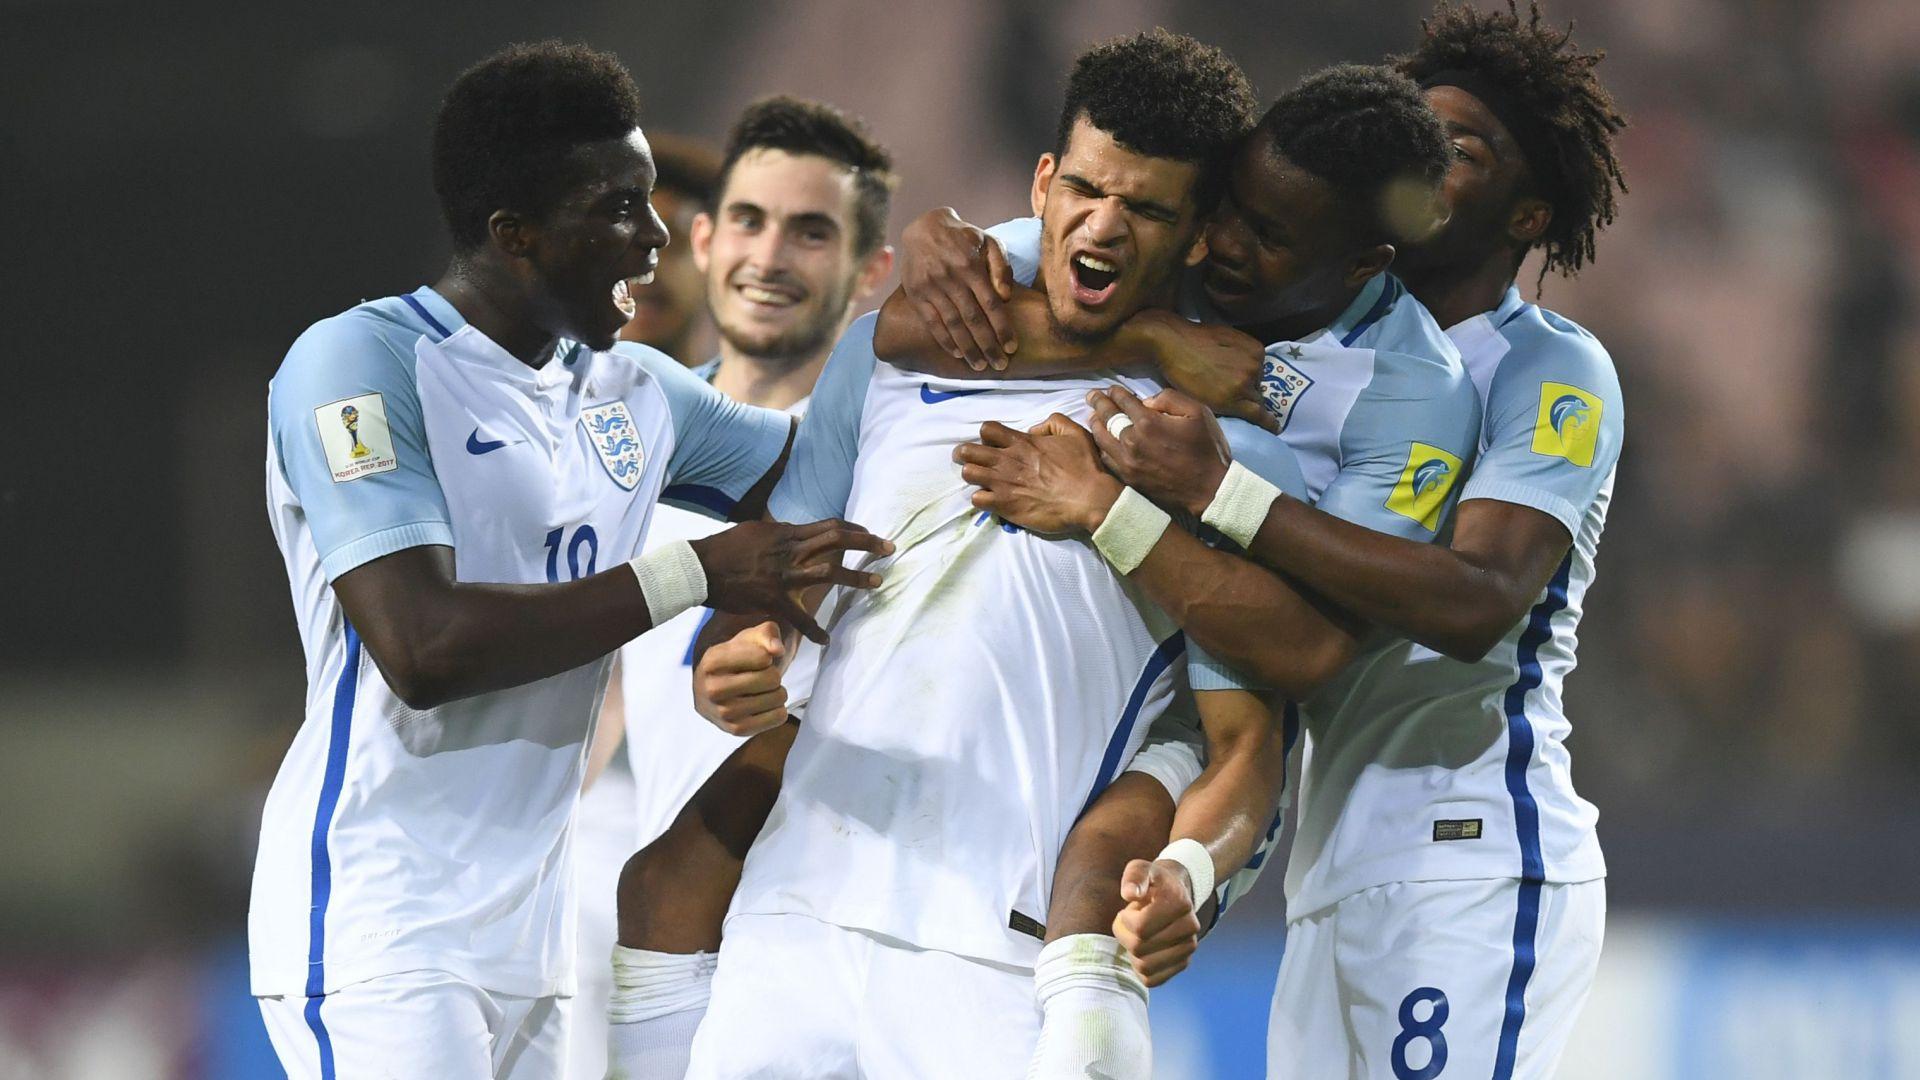 Dominic Solanke Italy England U20